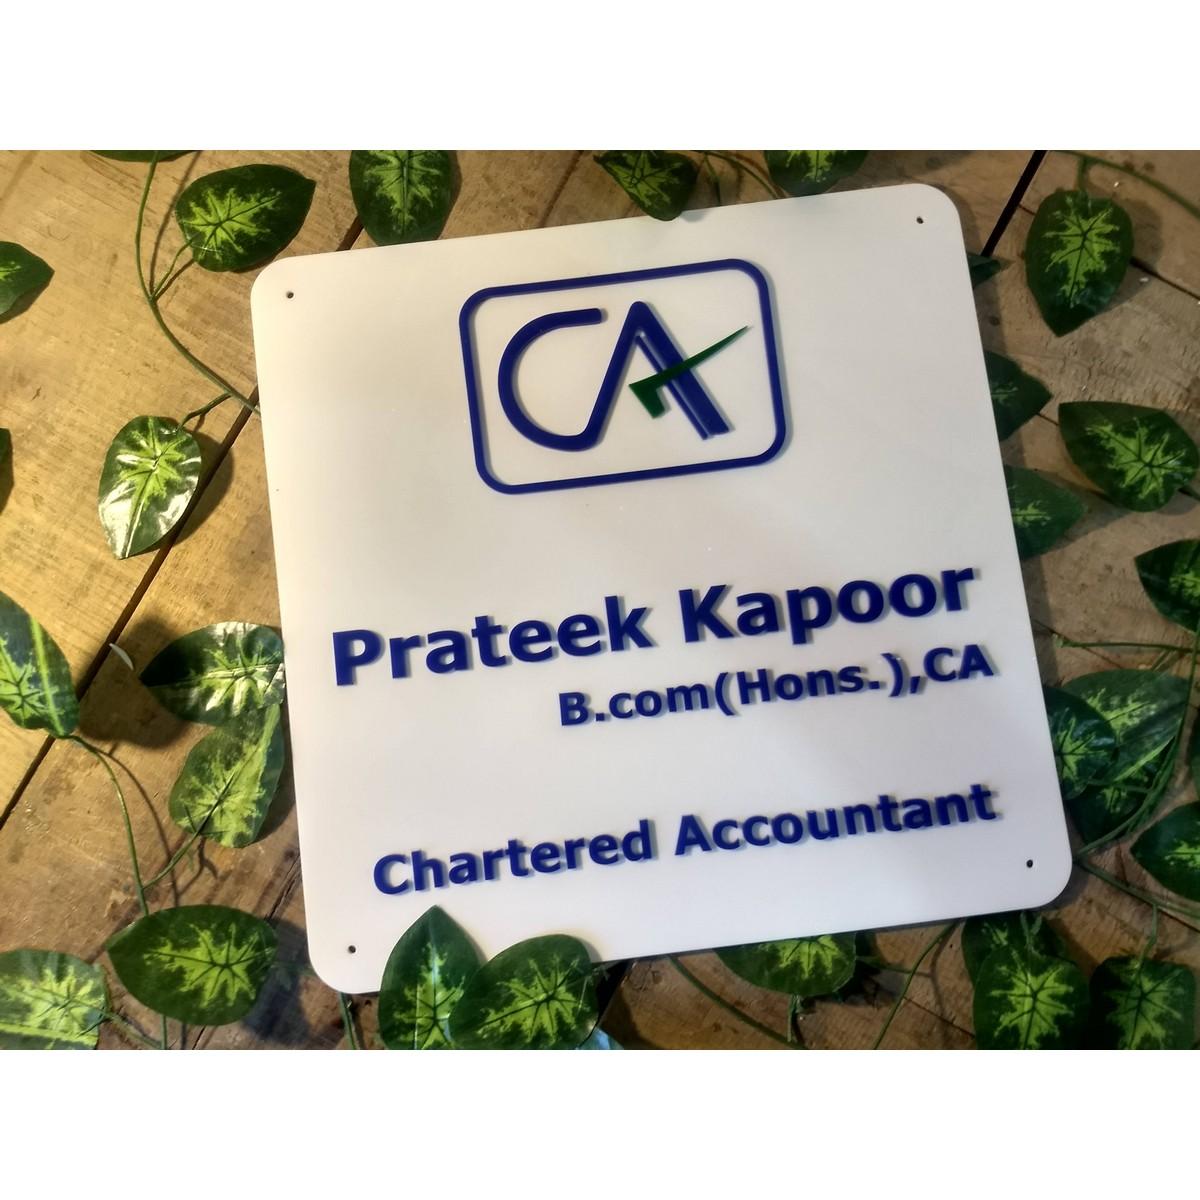 Chartered Accountant Weatherproof Name Plate  Chartered Accountant Weatherproof Name Plate 4